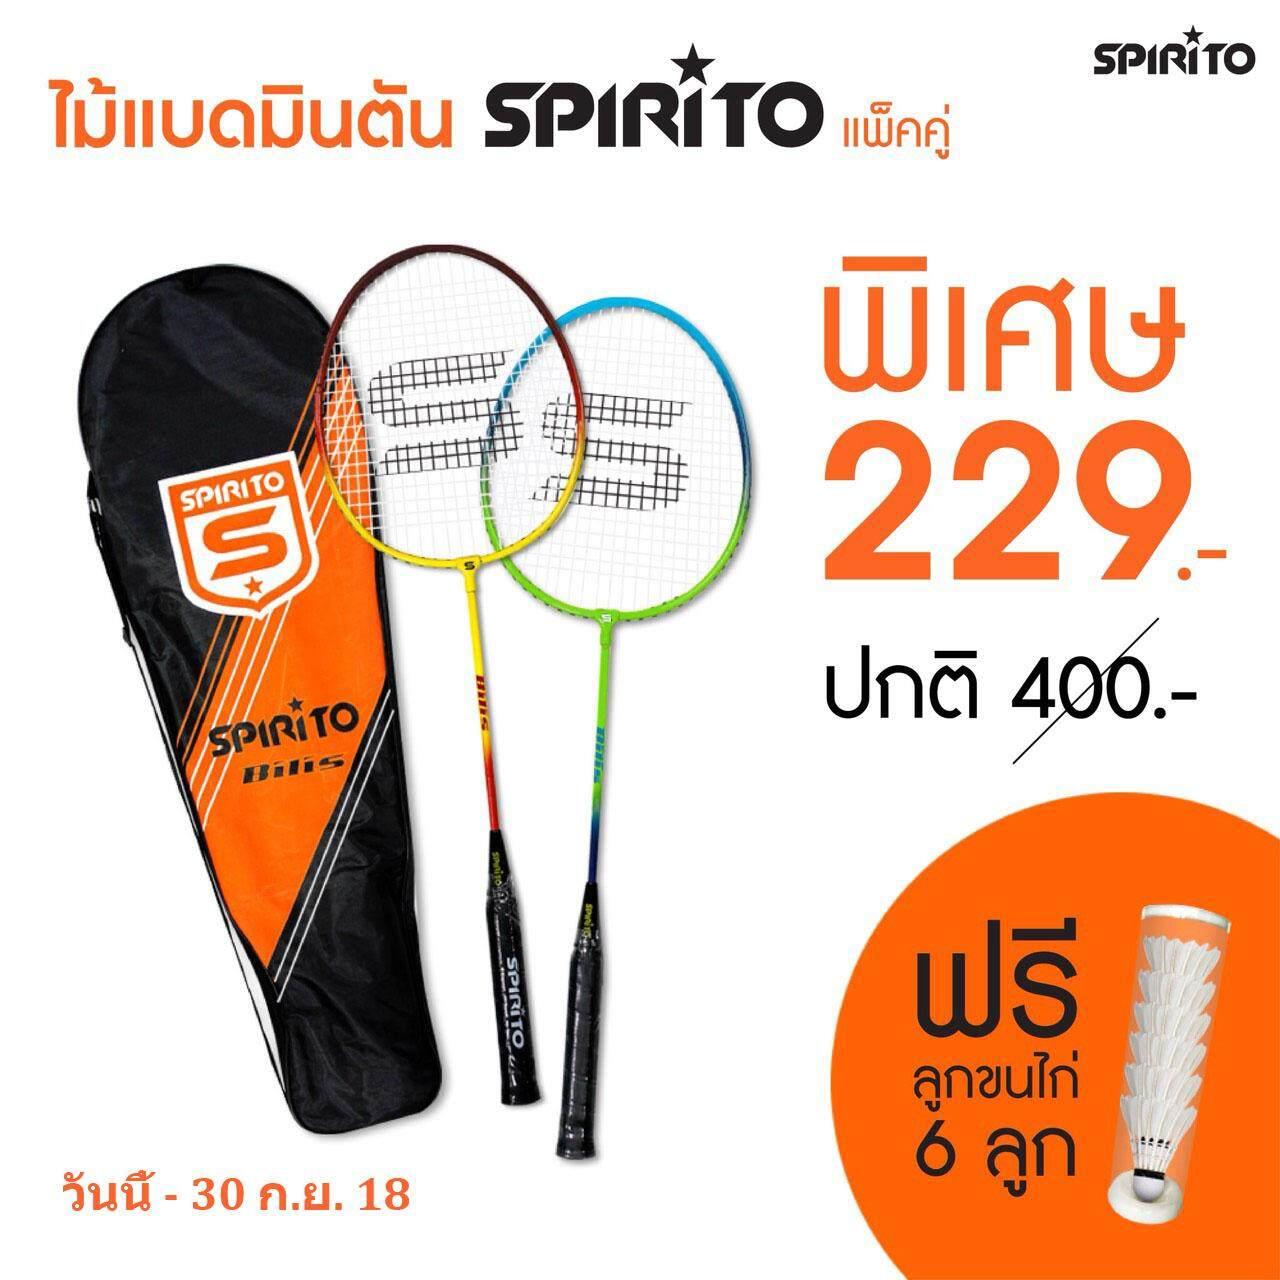 Grand Sport ไม้แแบดมินตัน Spirito(แพ็คคู่)+ลูกขนไก่ 6 ลูก (303105) By Grand Sport(mp).